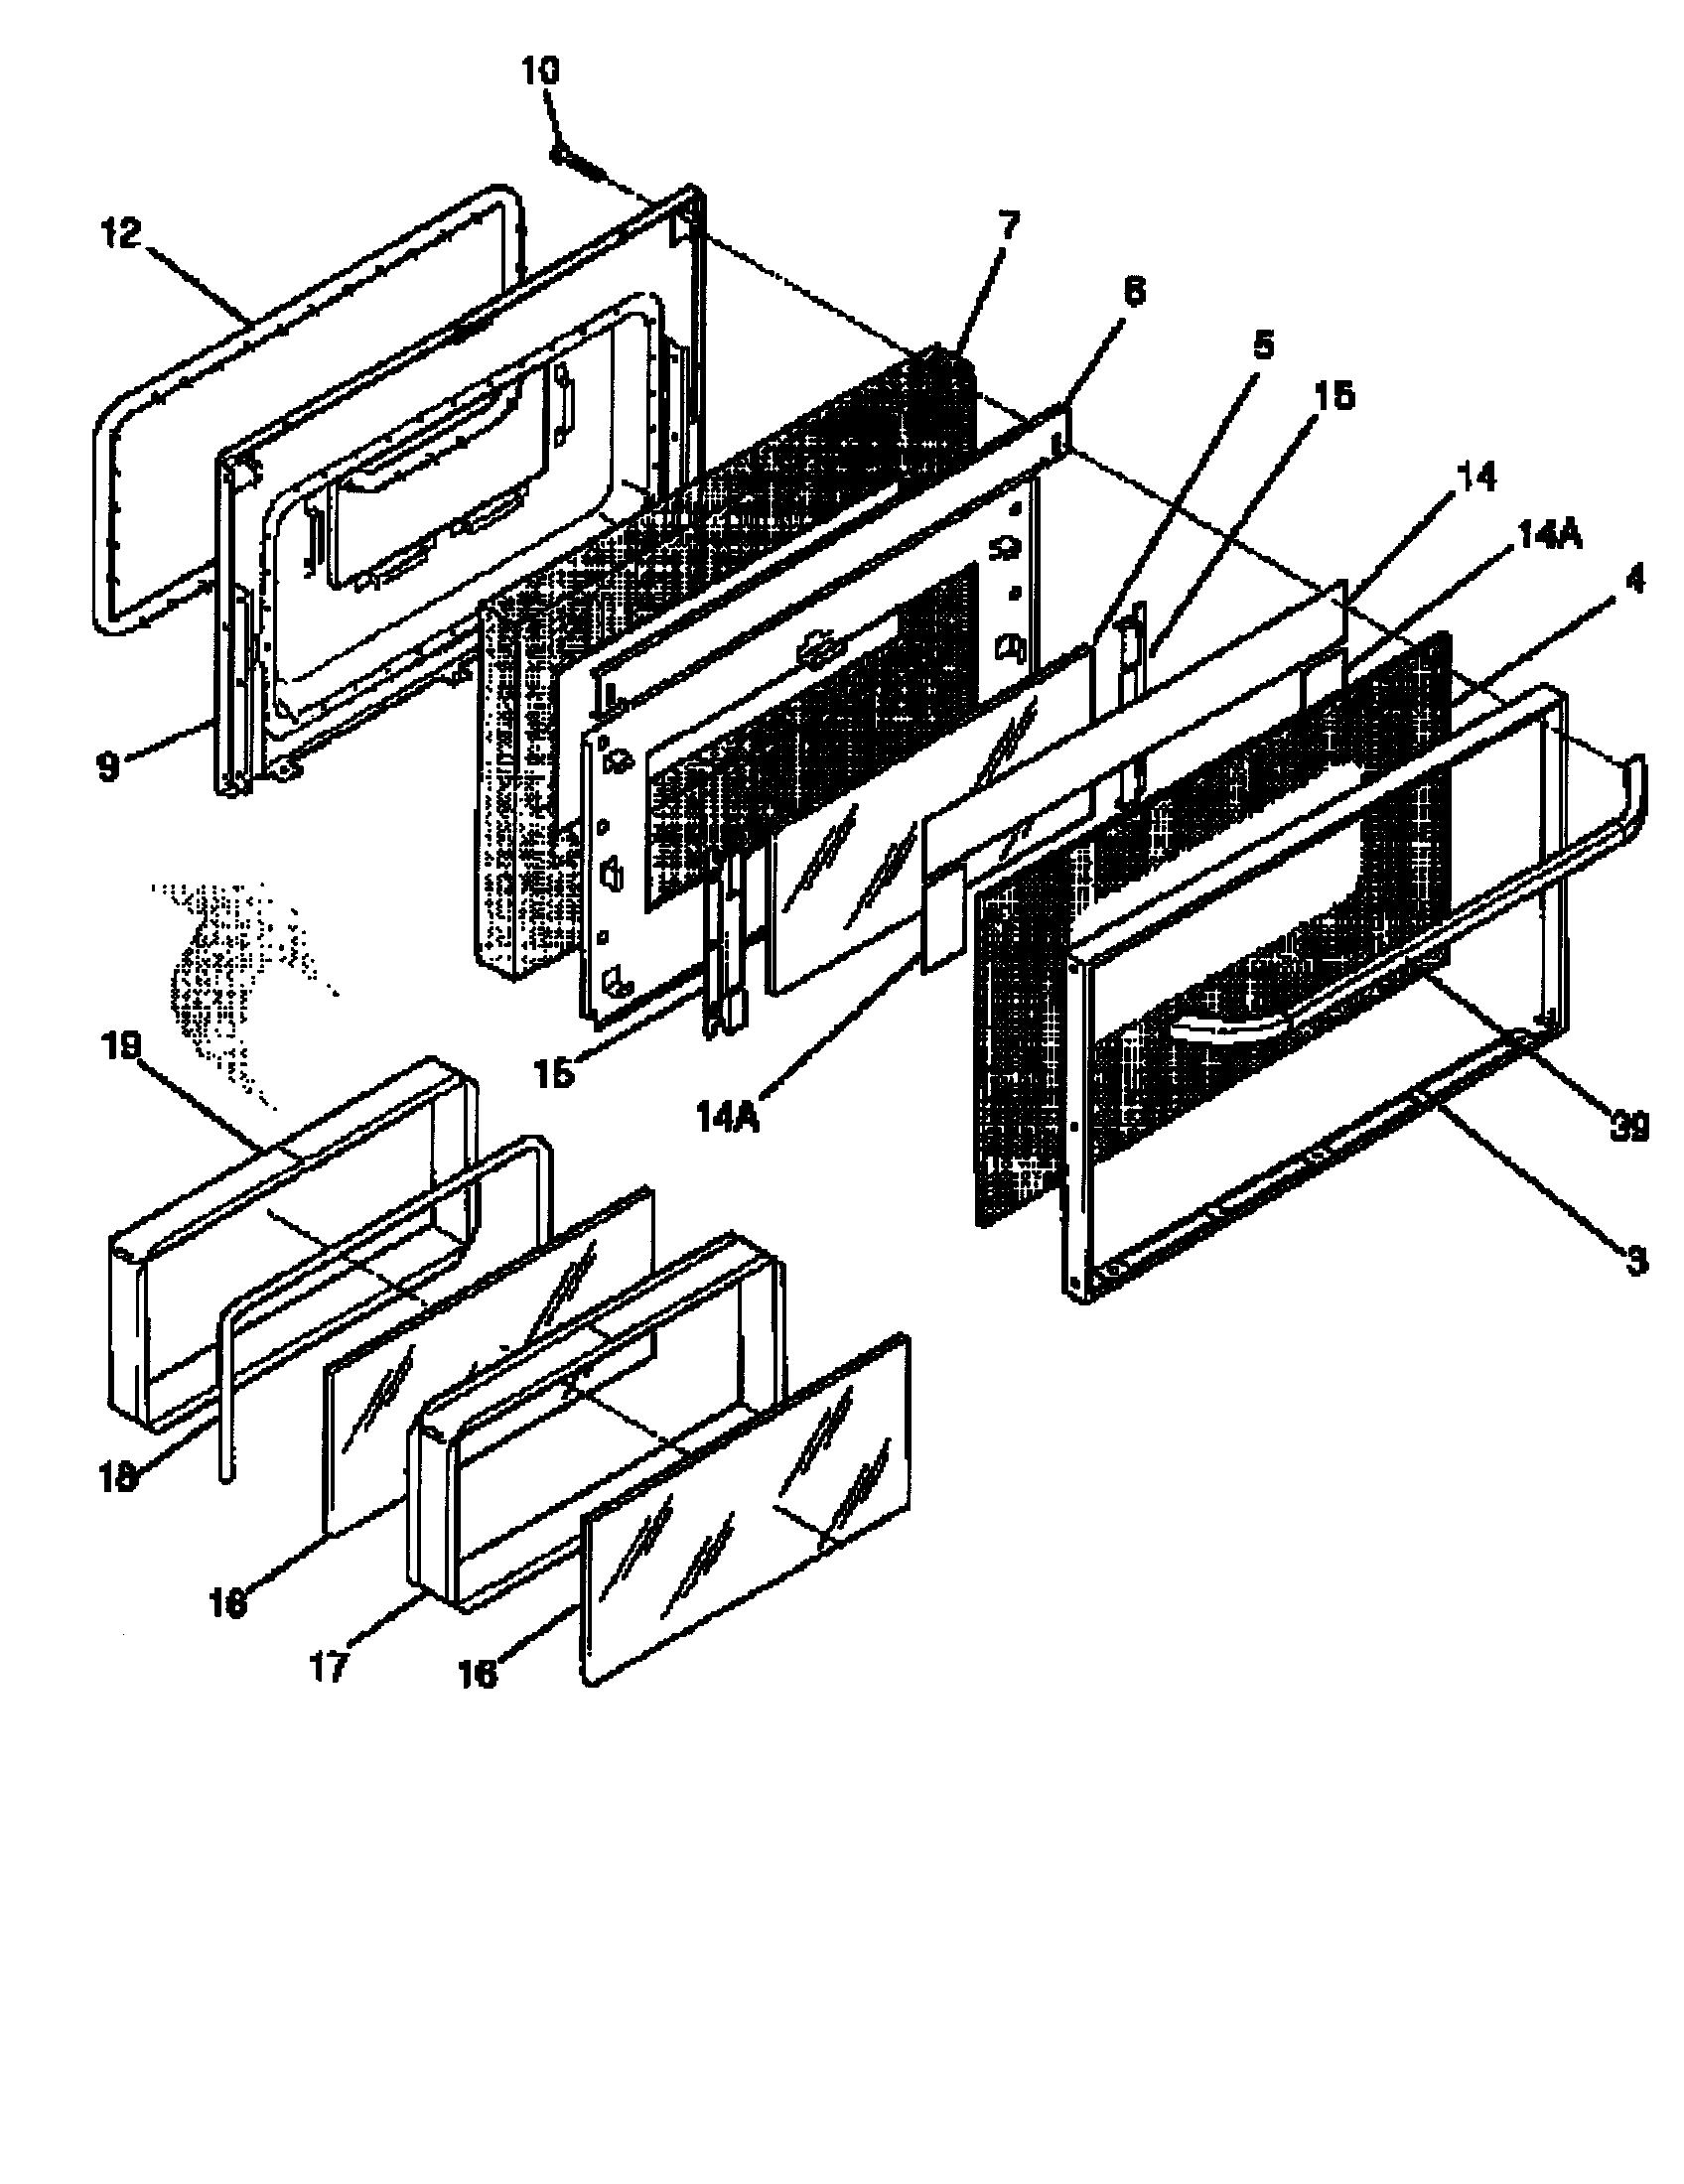 2002 Dodge Ram Van Coolant Diagram Html Com